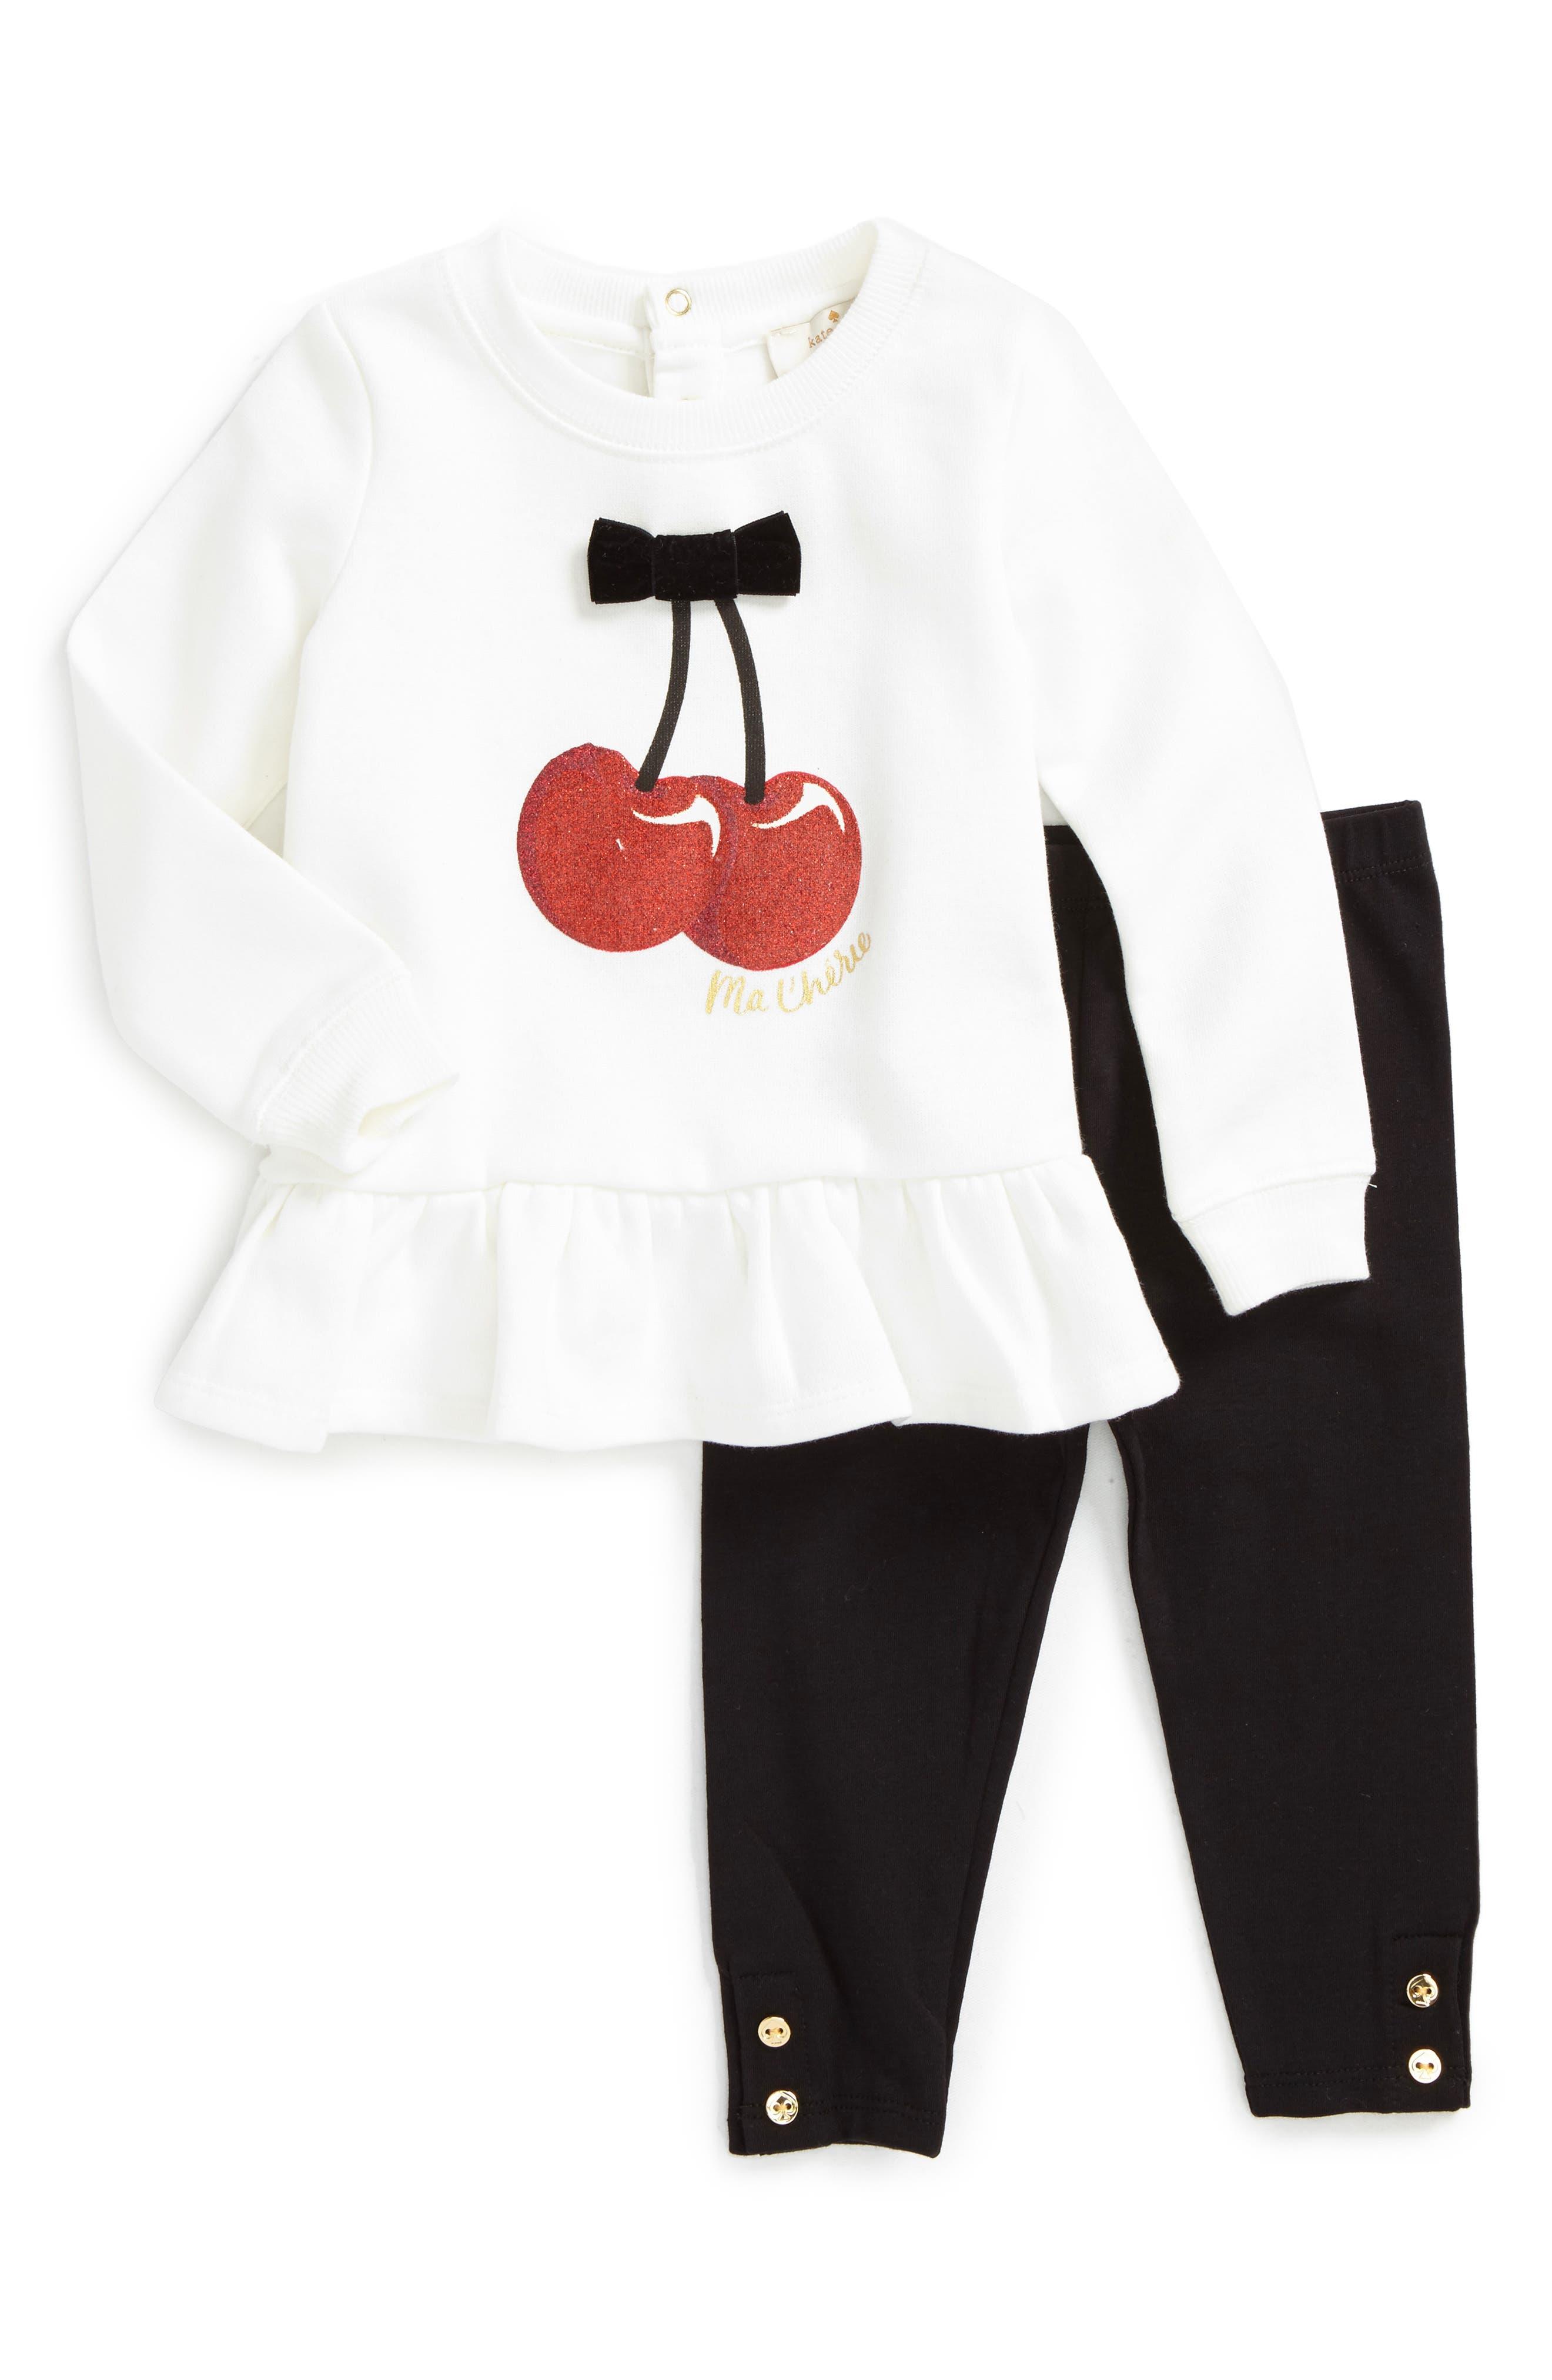 kate spade new york ma chérie graphic top & leggings set (Baby Girls)